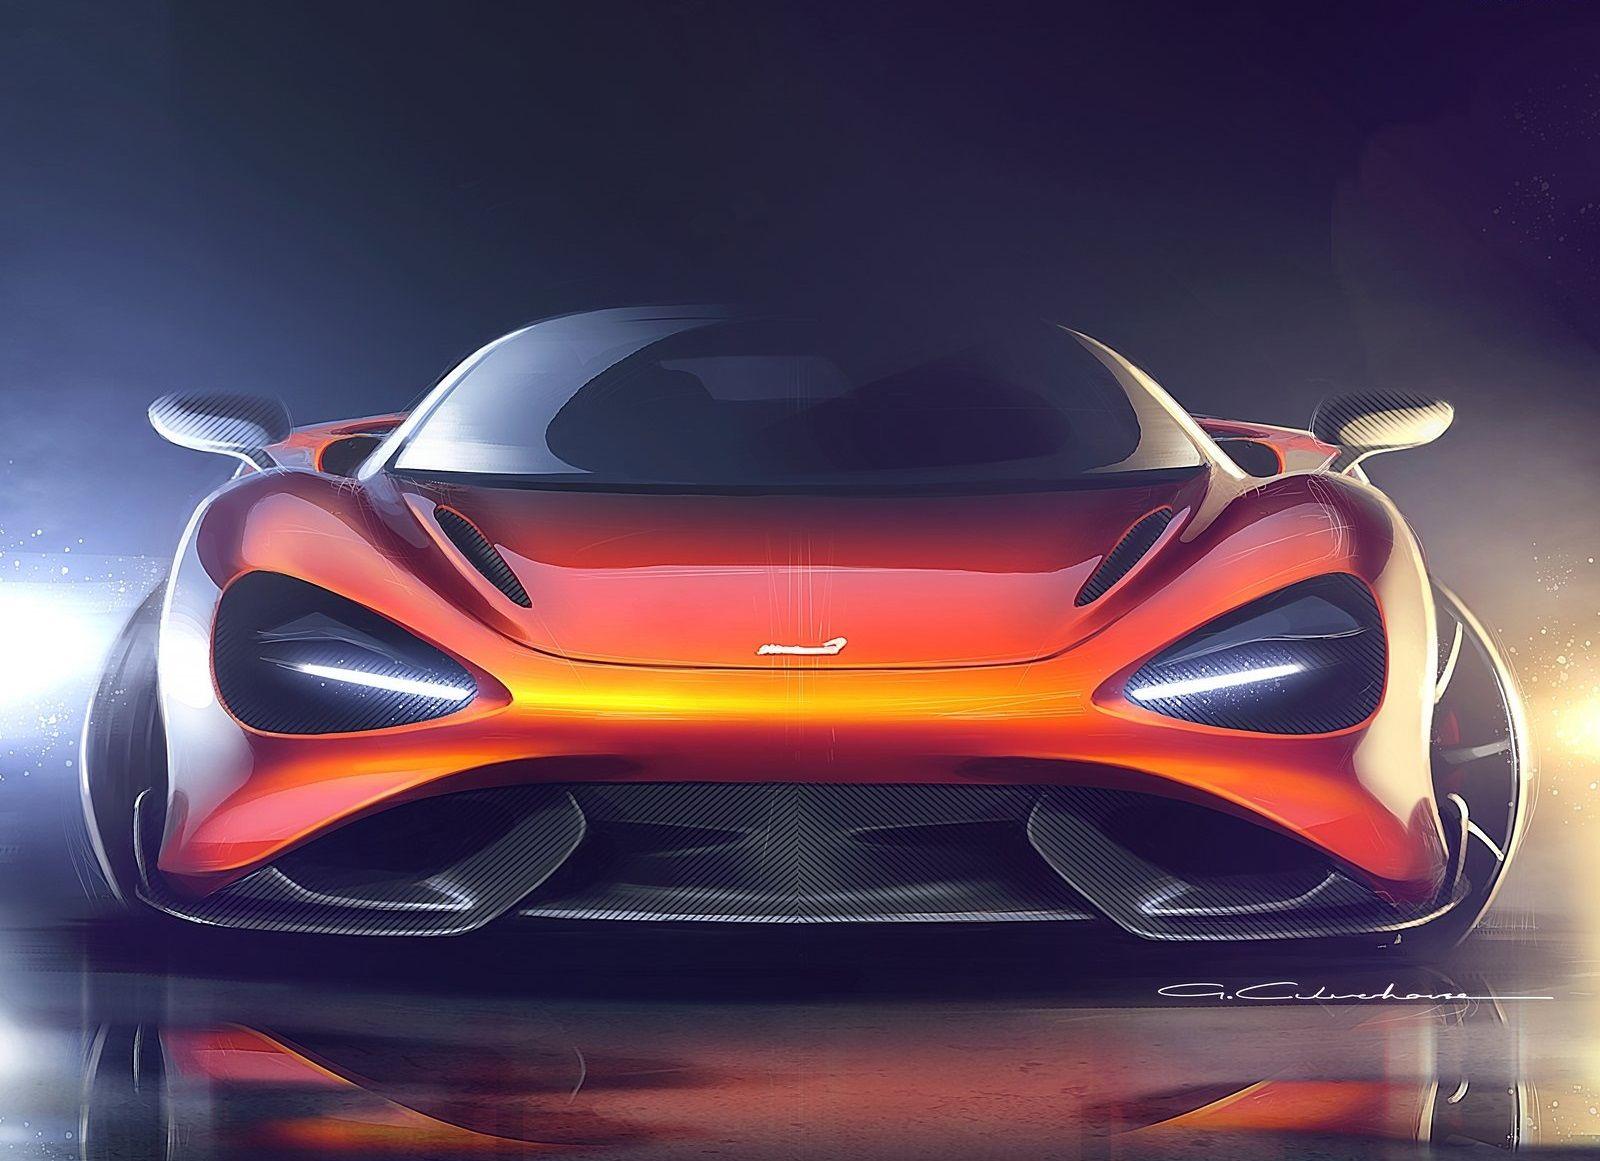 2020 Mclaren 765lt In 2020 Super Cars Mclaren Cars Mclaren